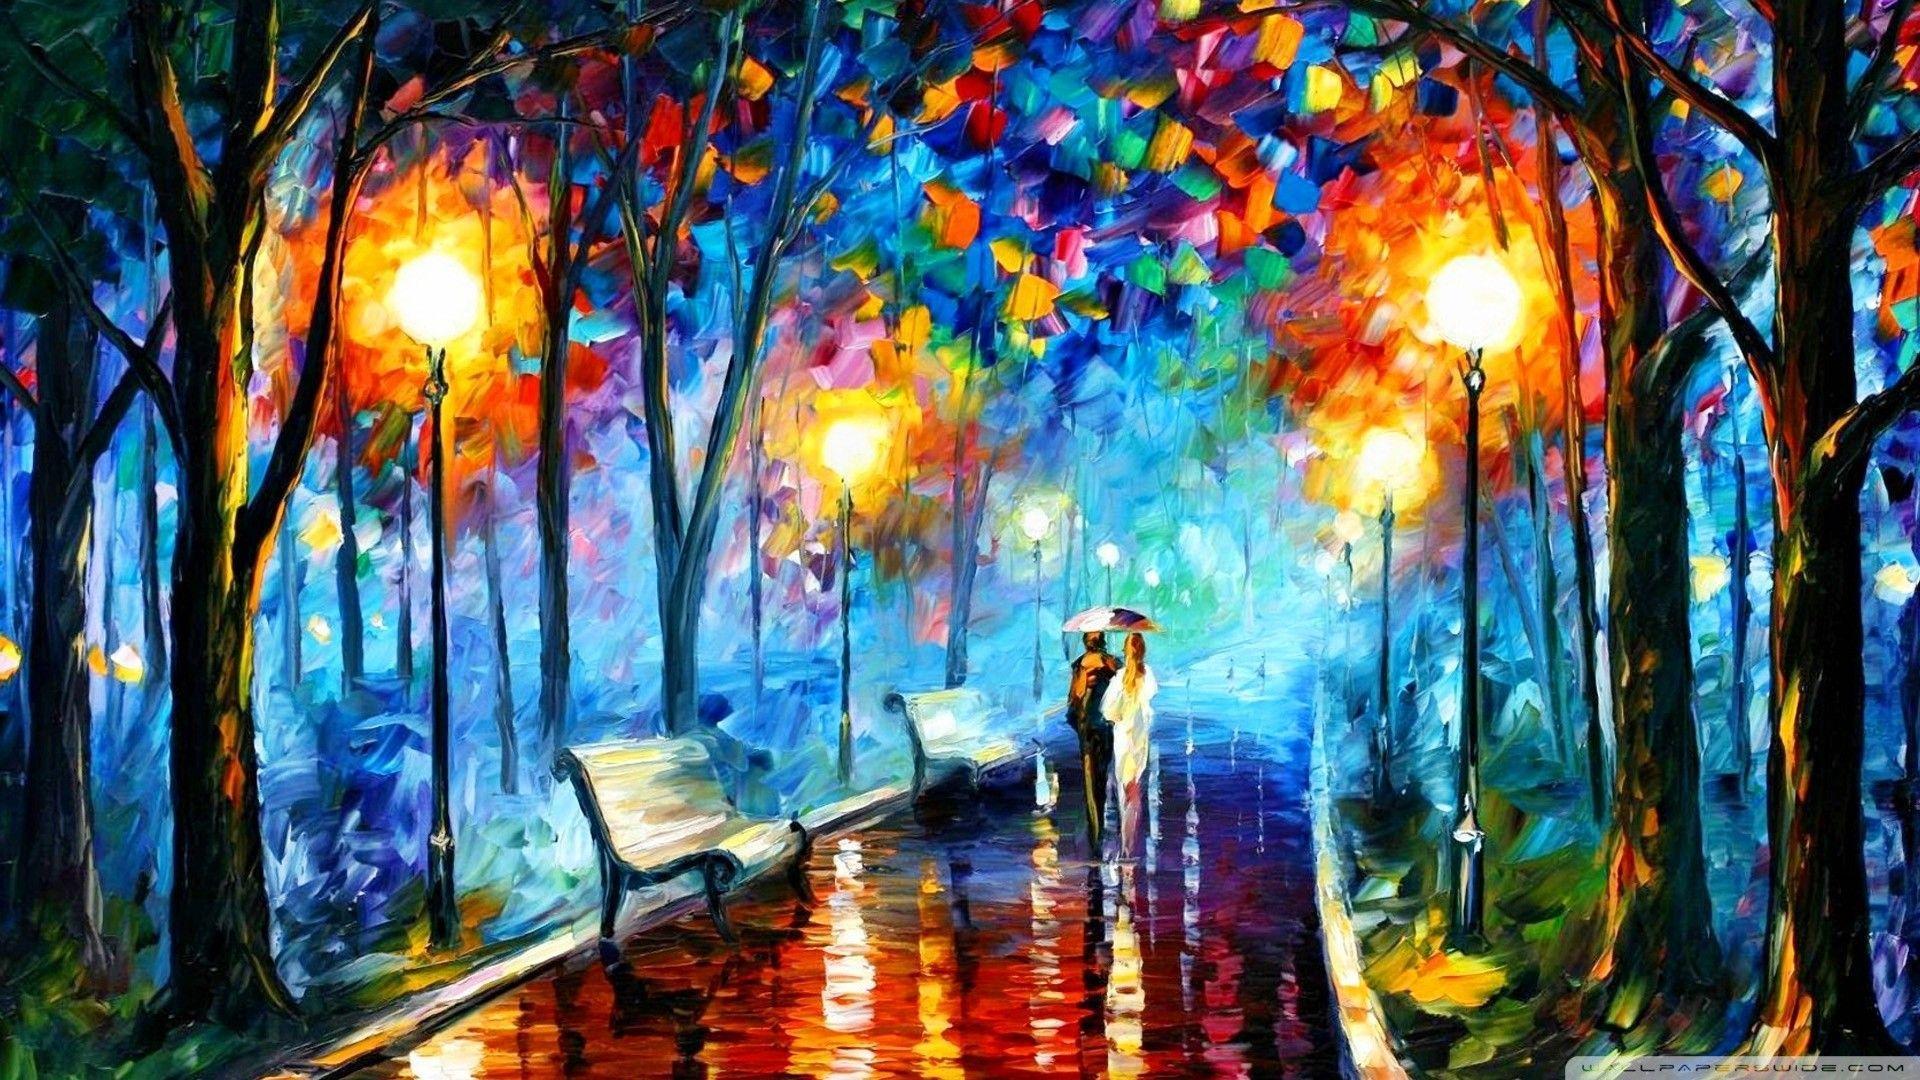 Fine Art Desktop Wallpapers Top Free Fine Art Desktop Backgrounds Wallpaperaccess